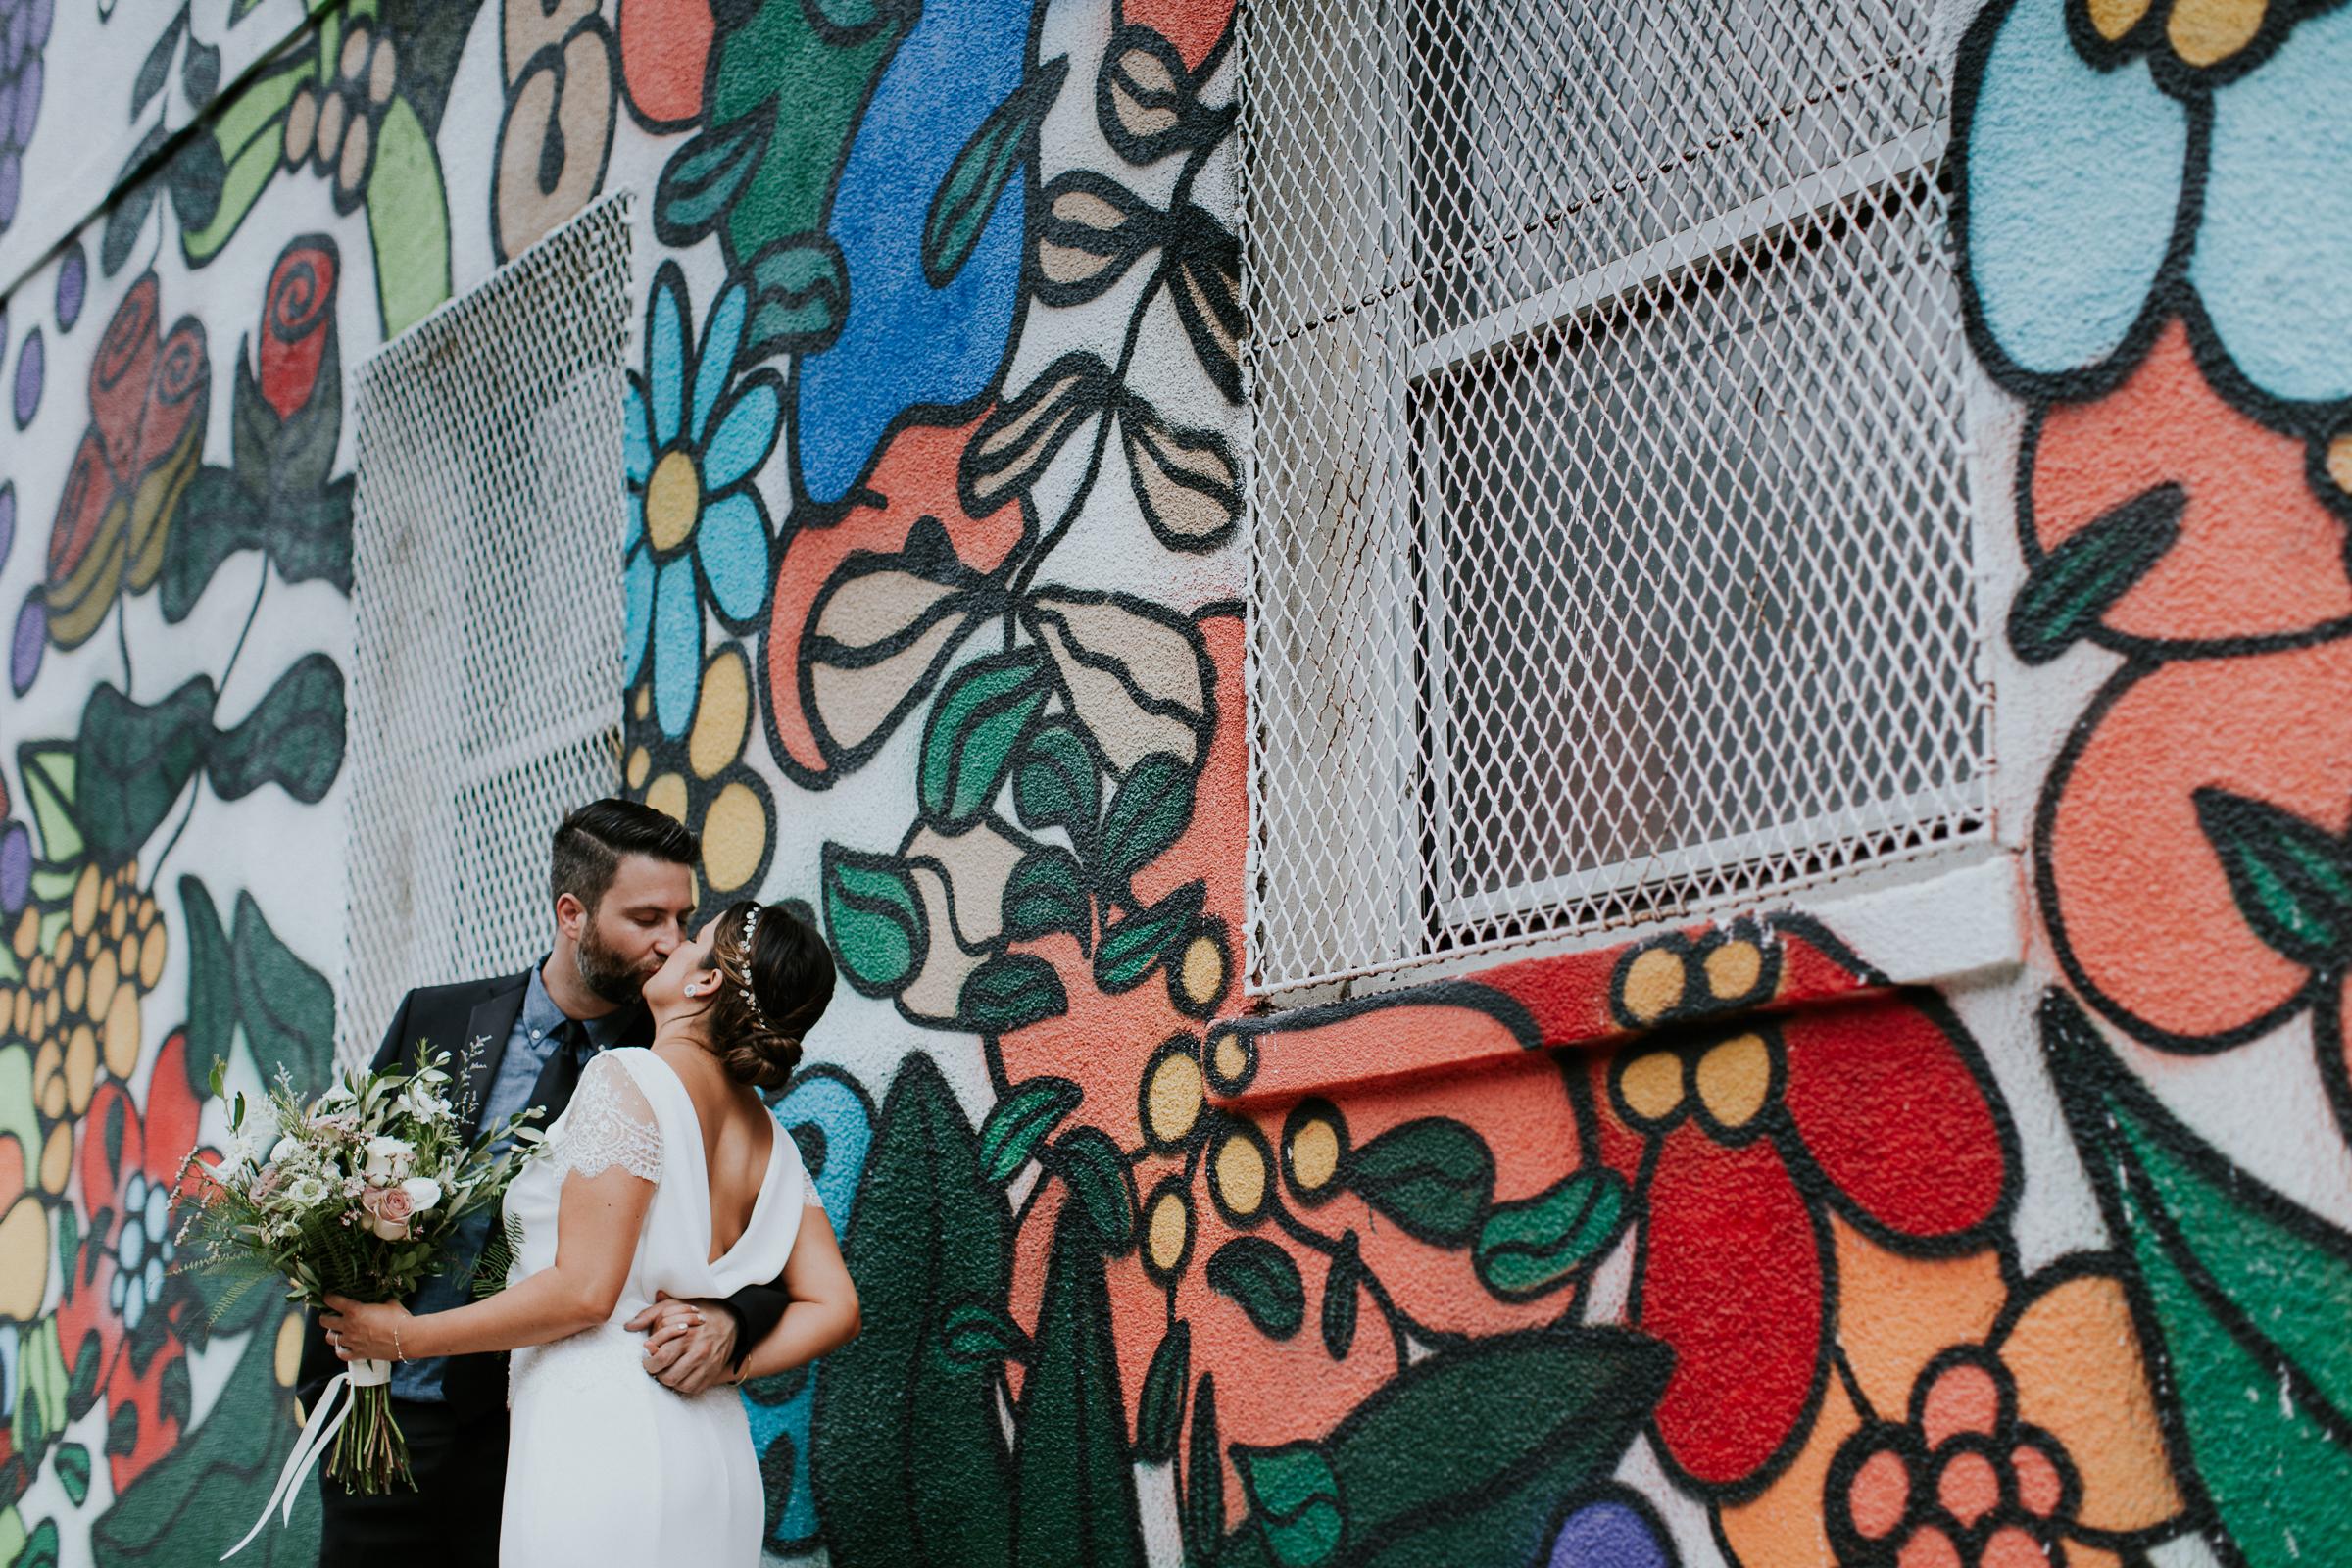 501-Union-Brooklyn-Fine-Art-Documentary-Wedding-Photographer-48.jpg